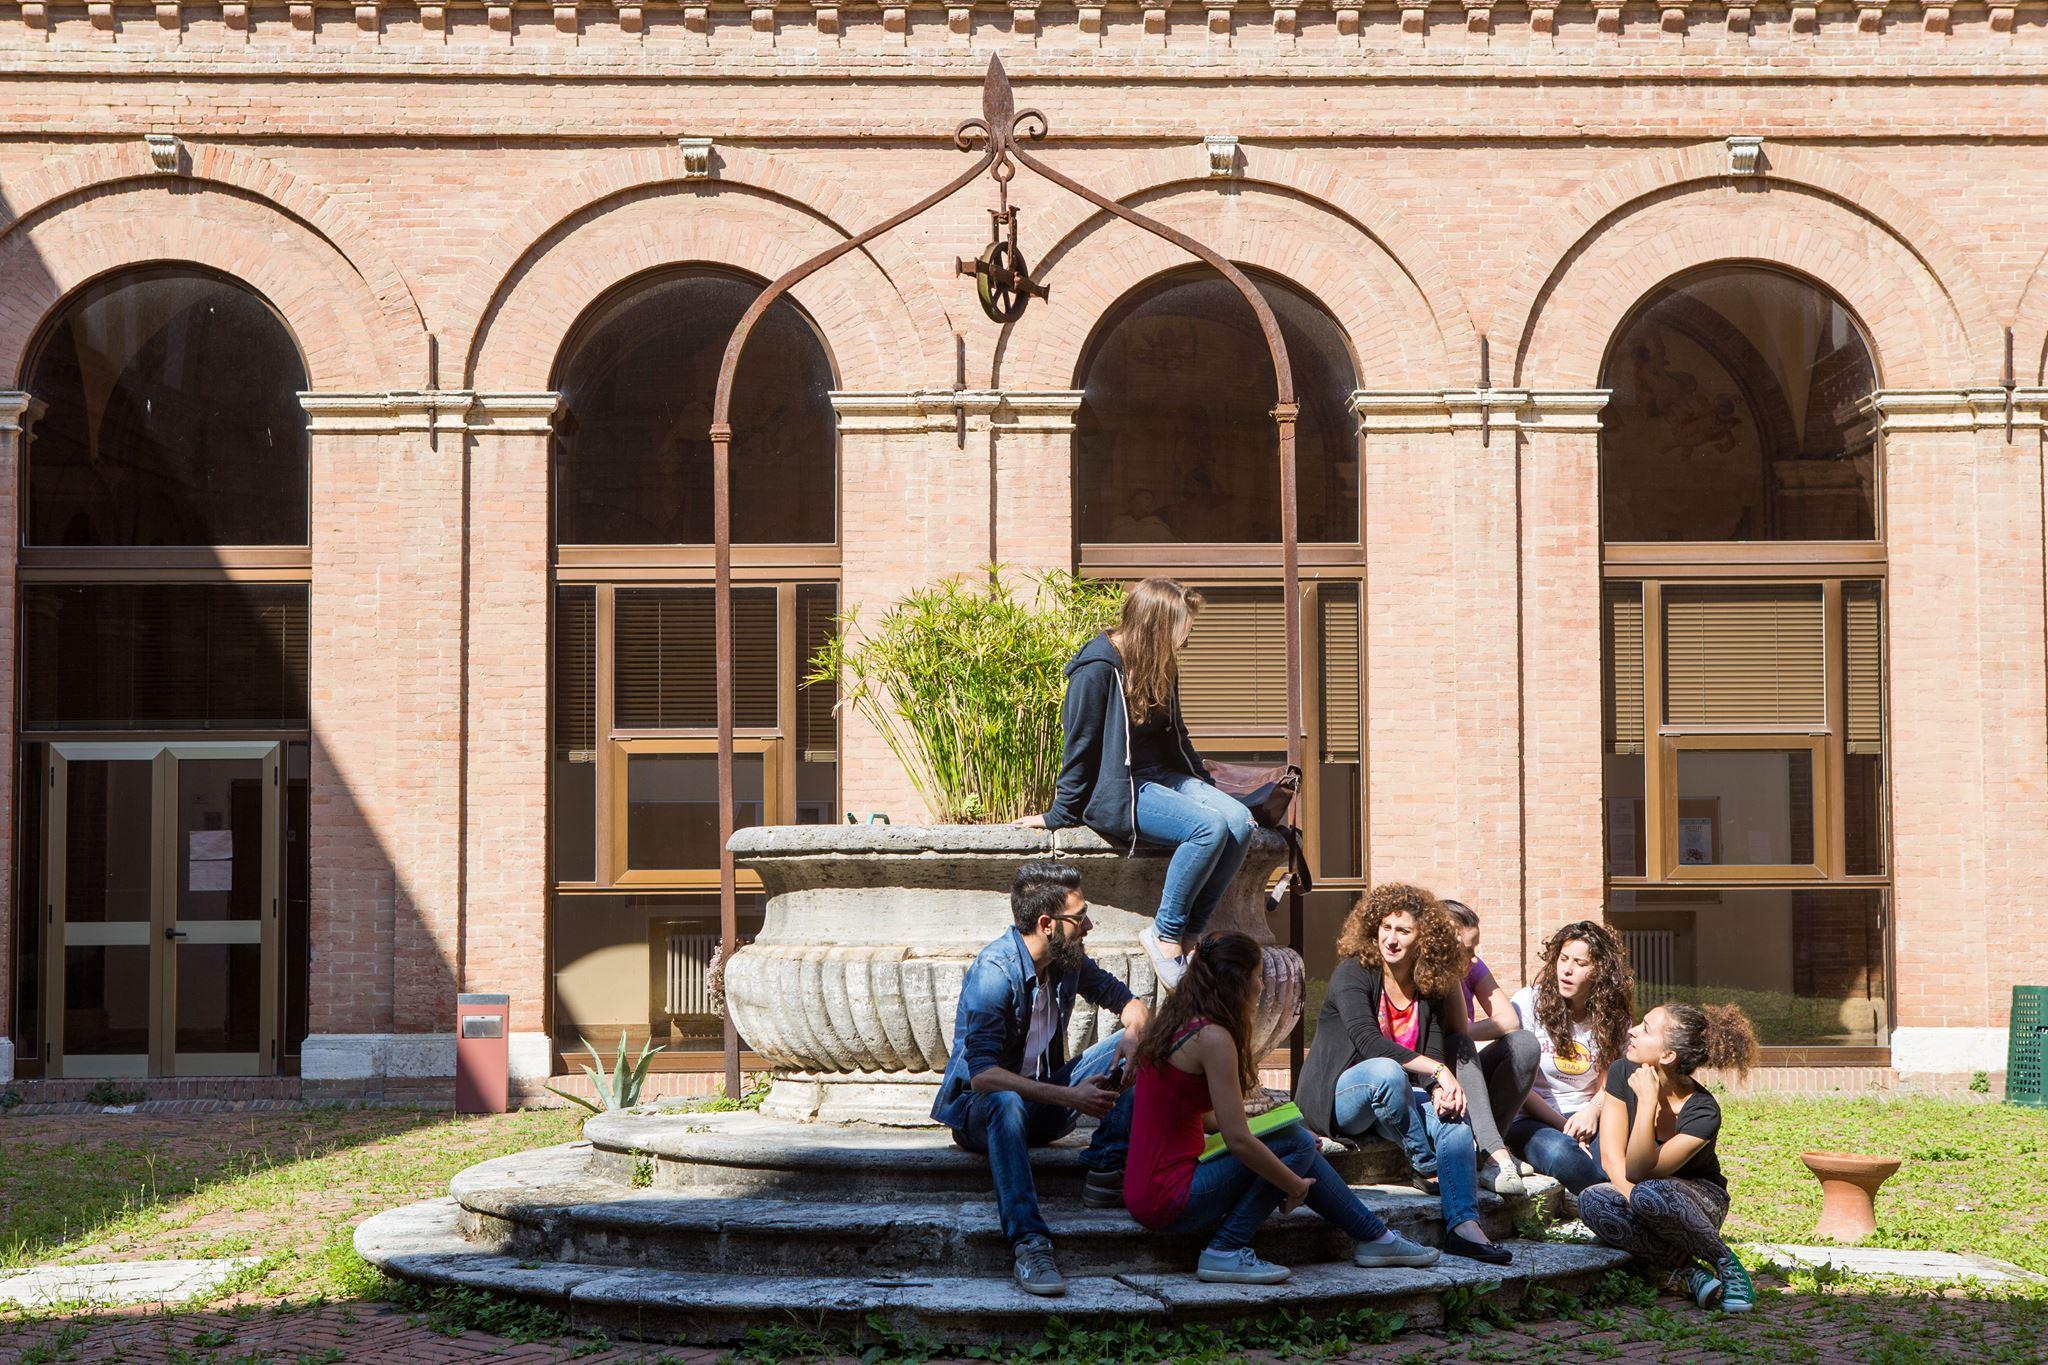 University of Siena – UNISI Campus